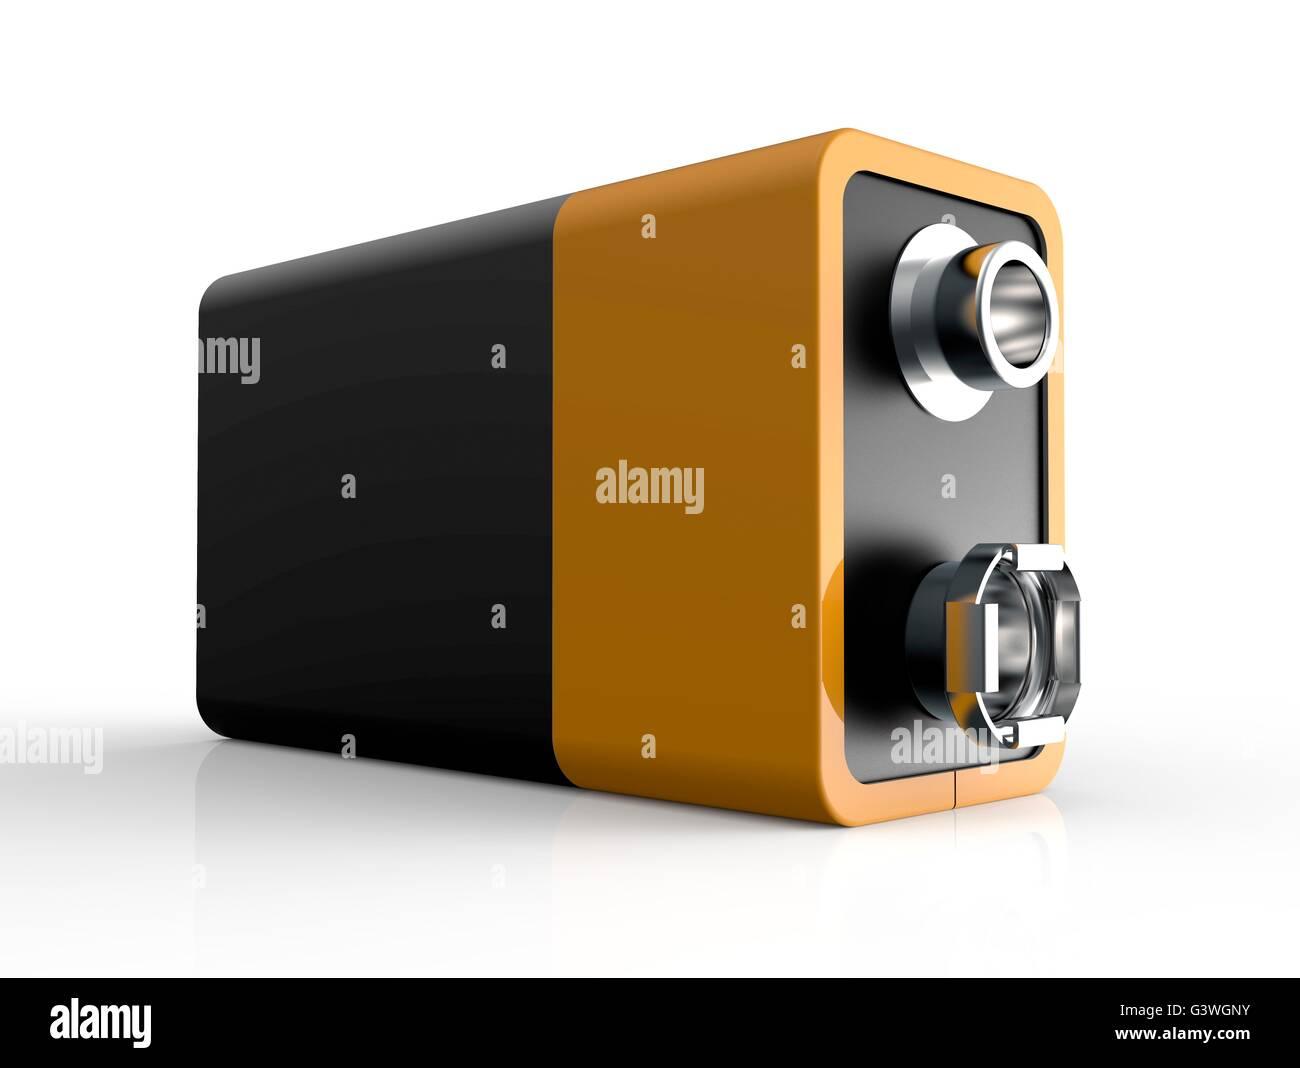 battery stockfotos battery bilder alamy. Black Bedroom Furniture Sets. Home Design Ideas